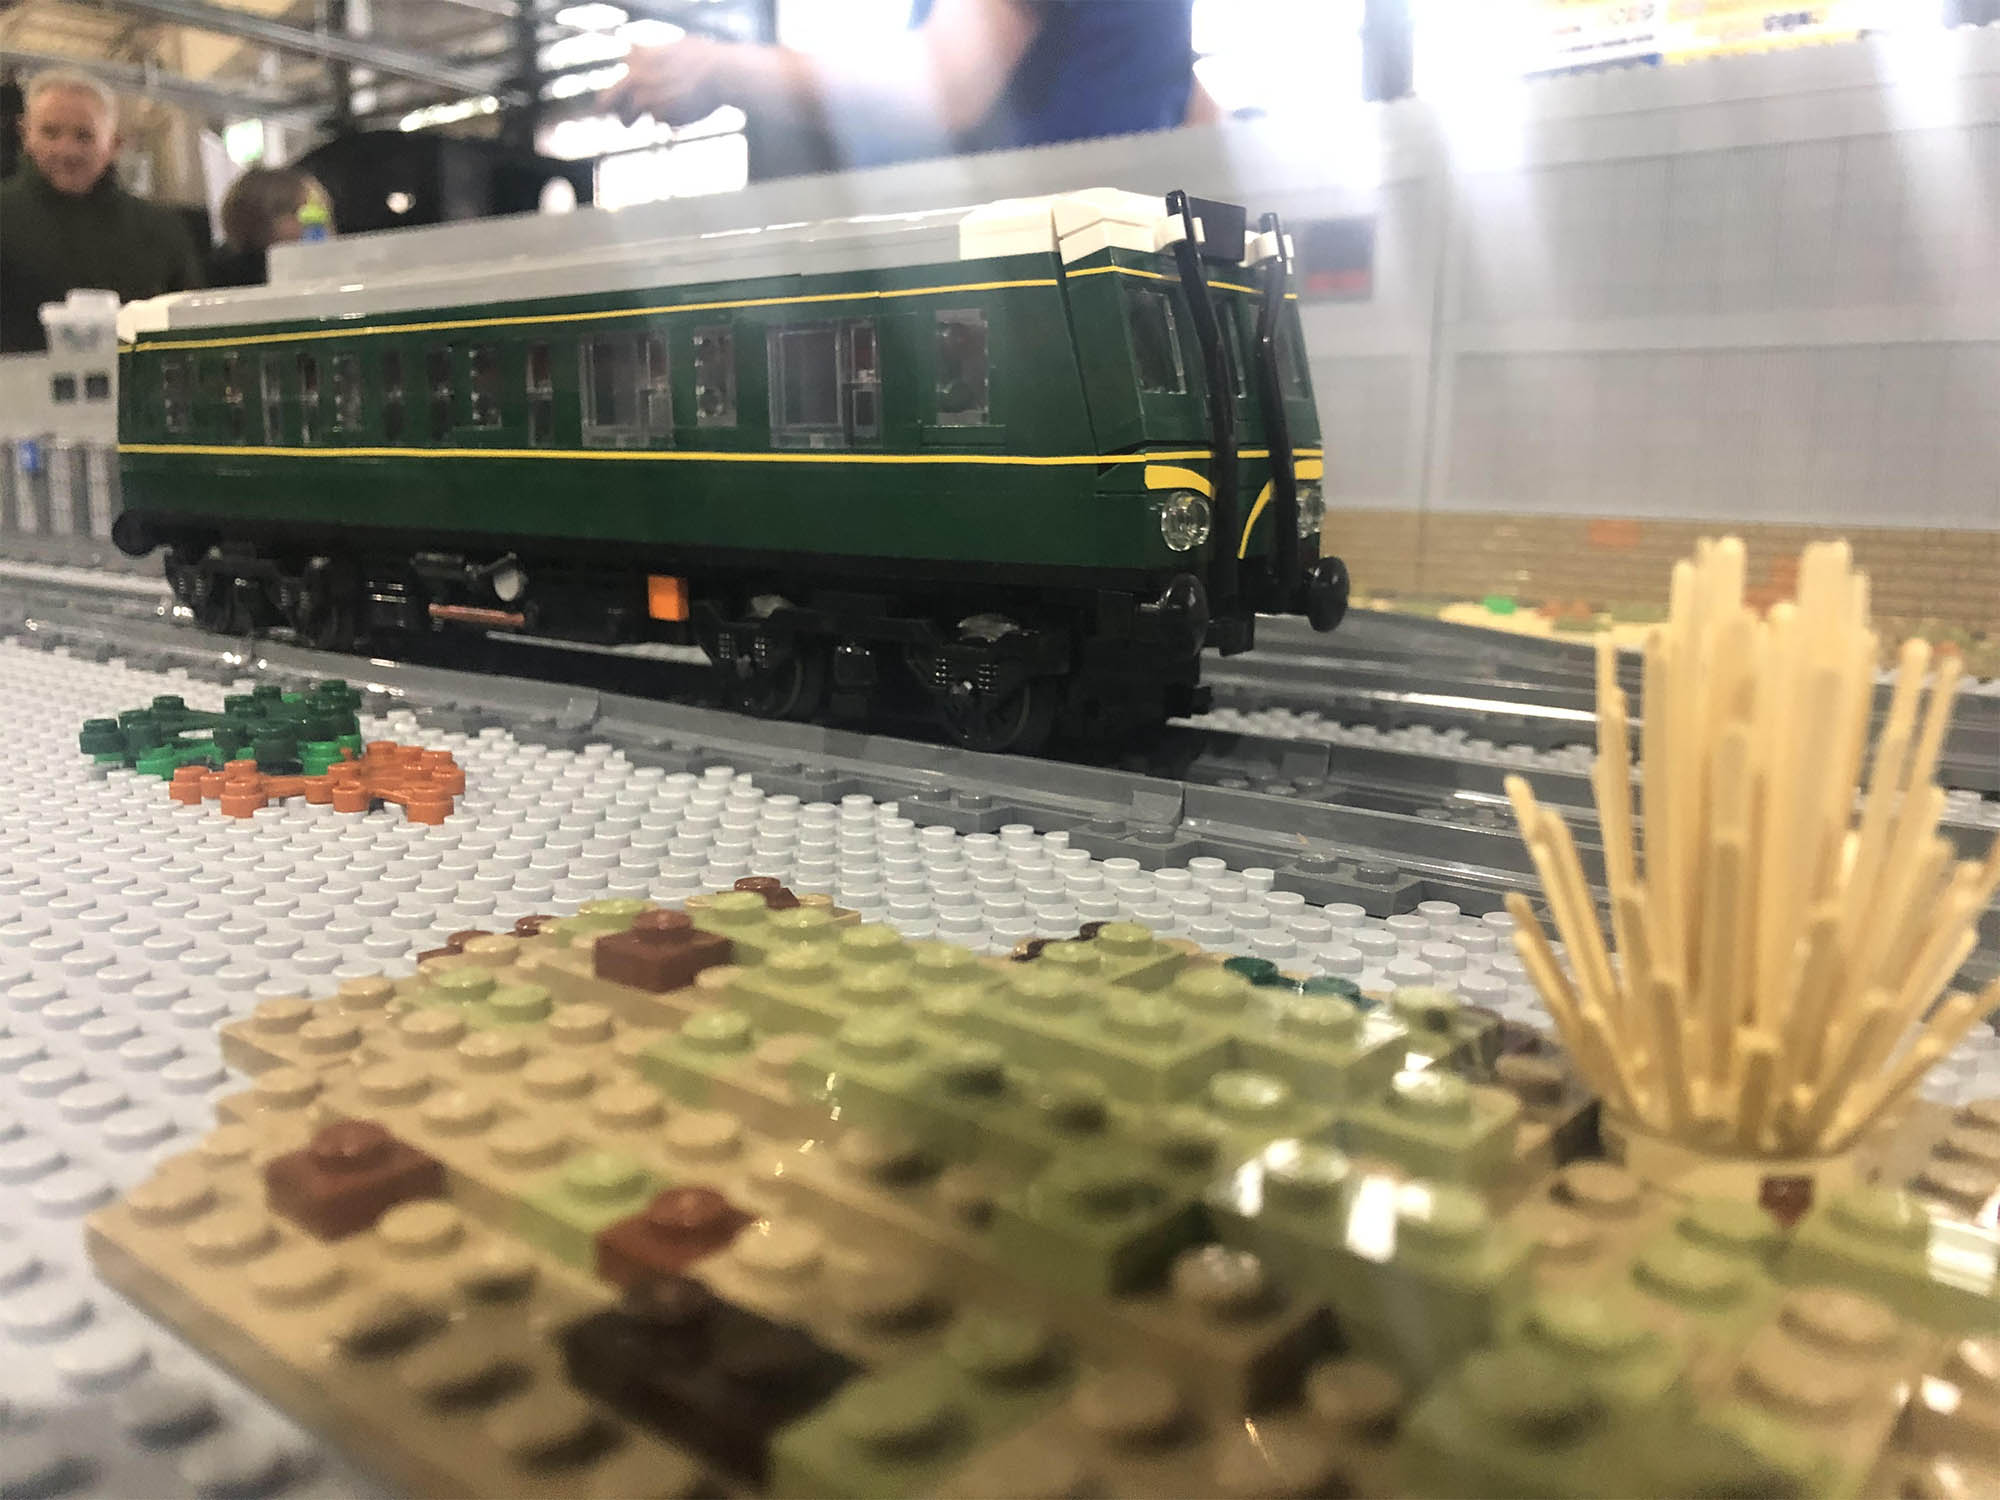 LEGO model of Class 121 DMU